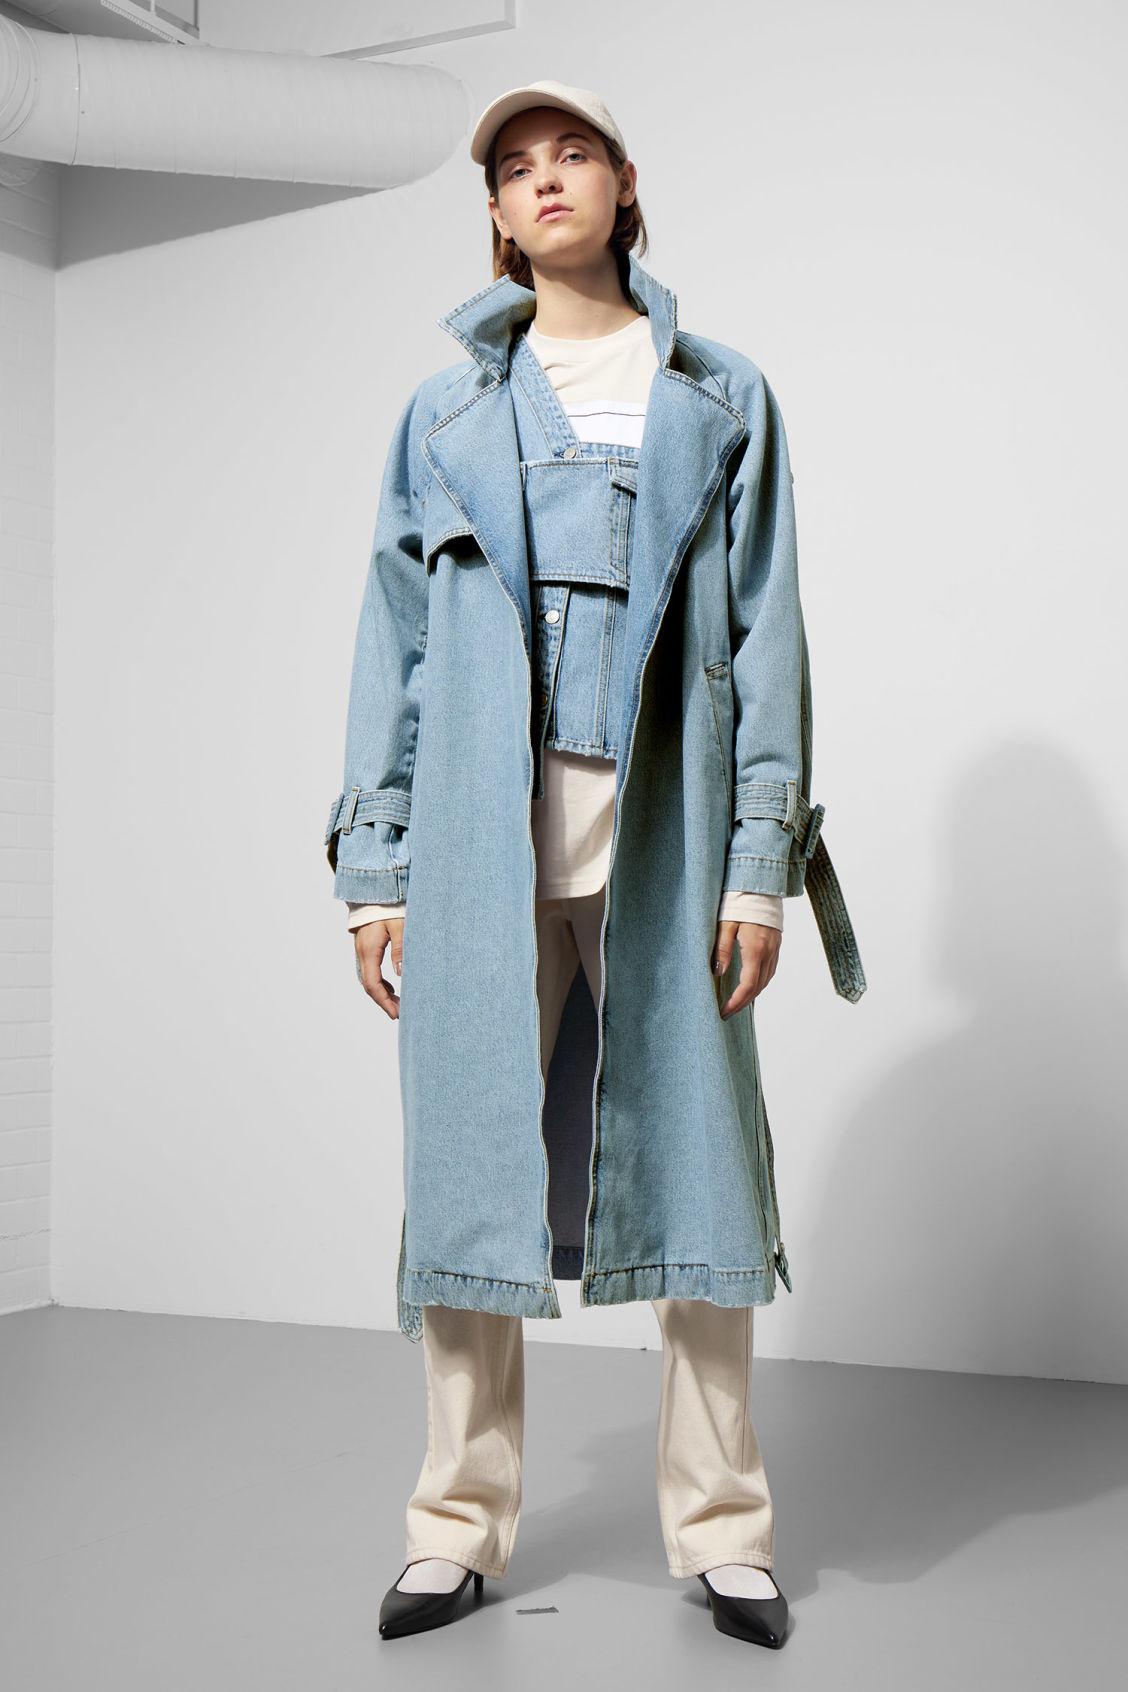 Coats Coat Blue amp; California Jackets Weekday Trench 8n5S1qBwBX